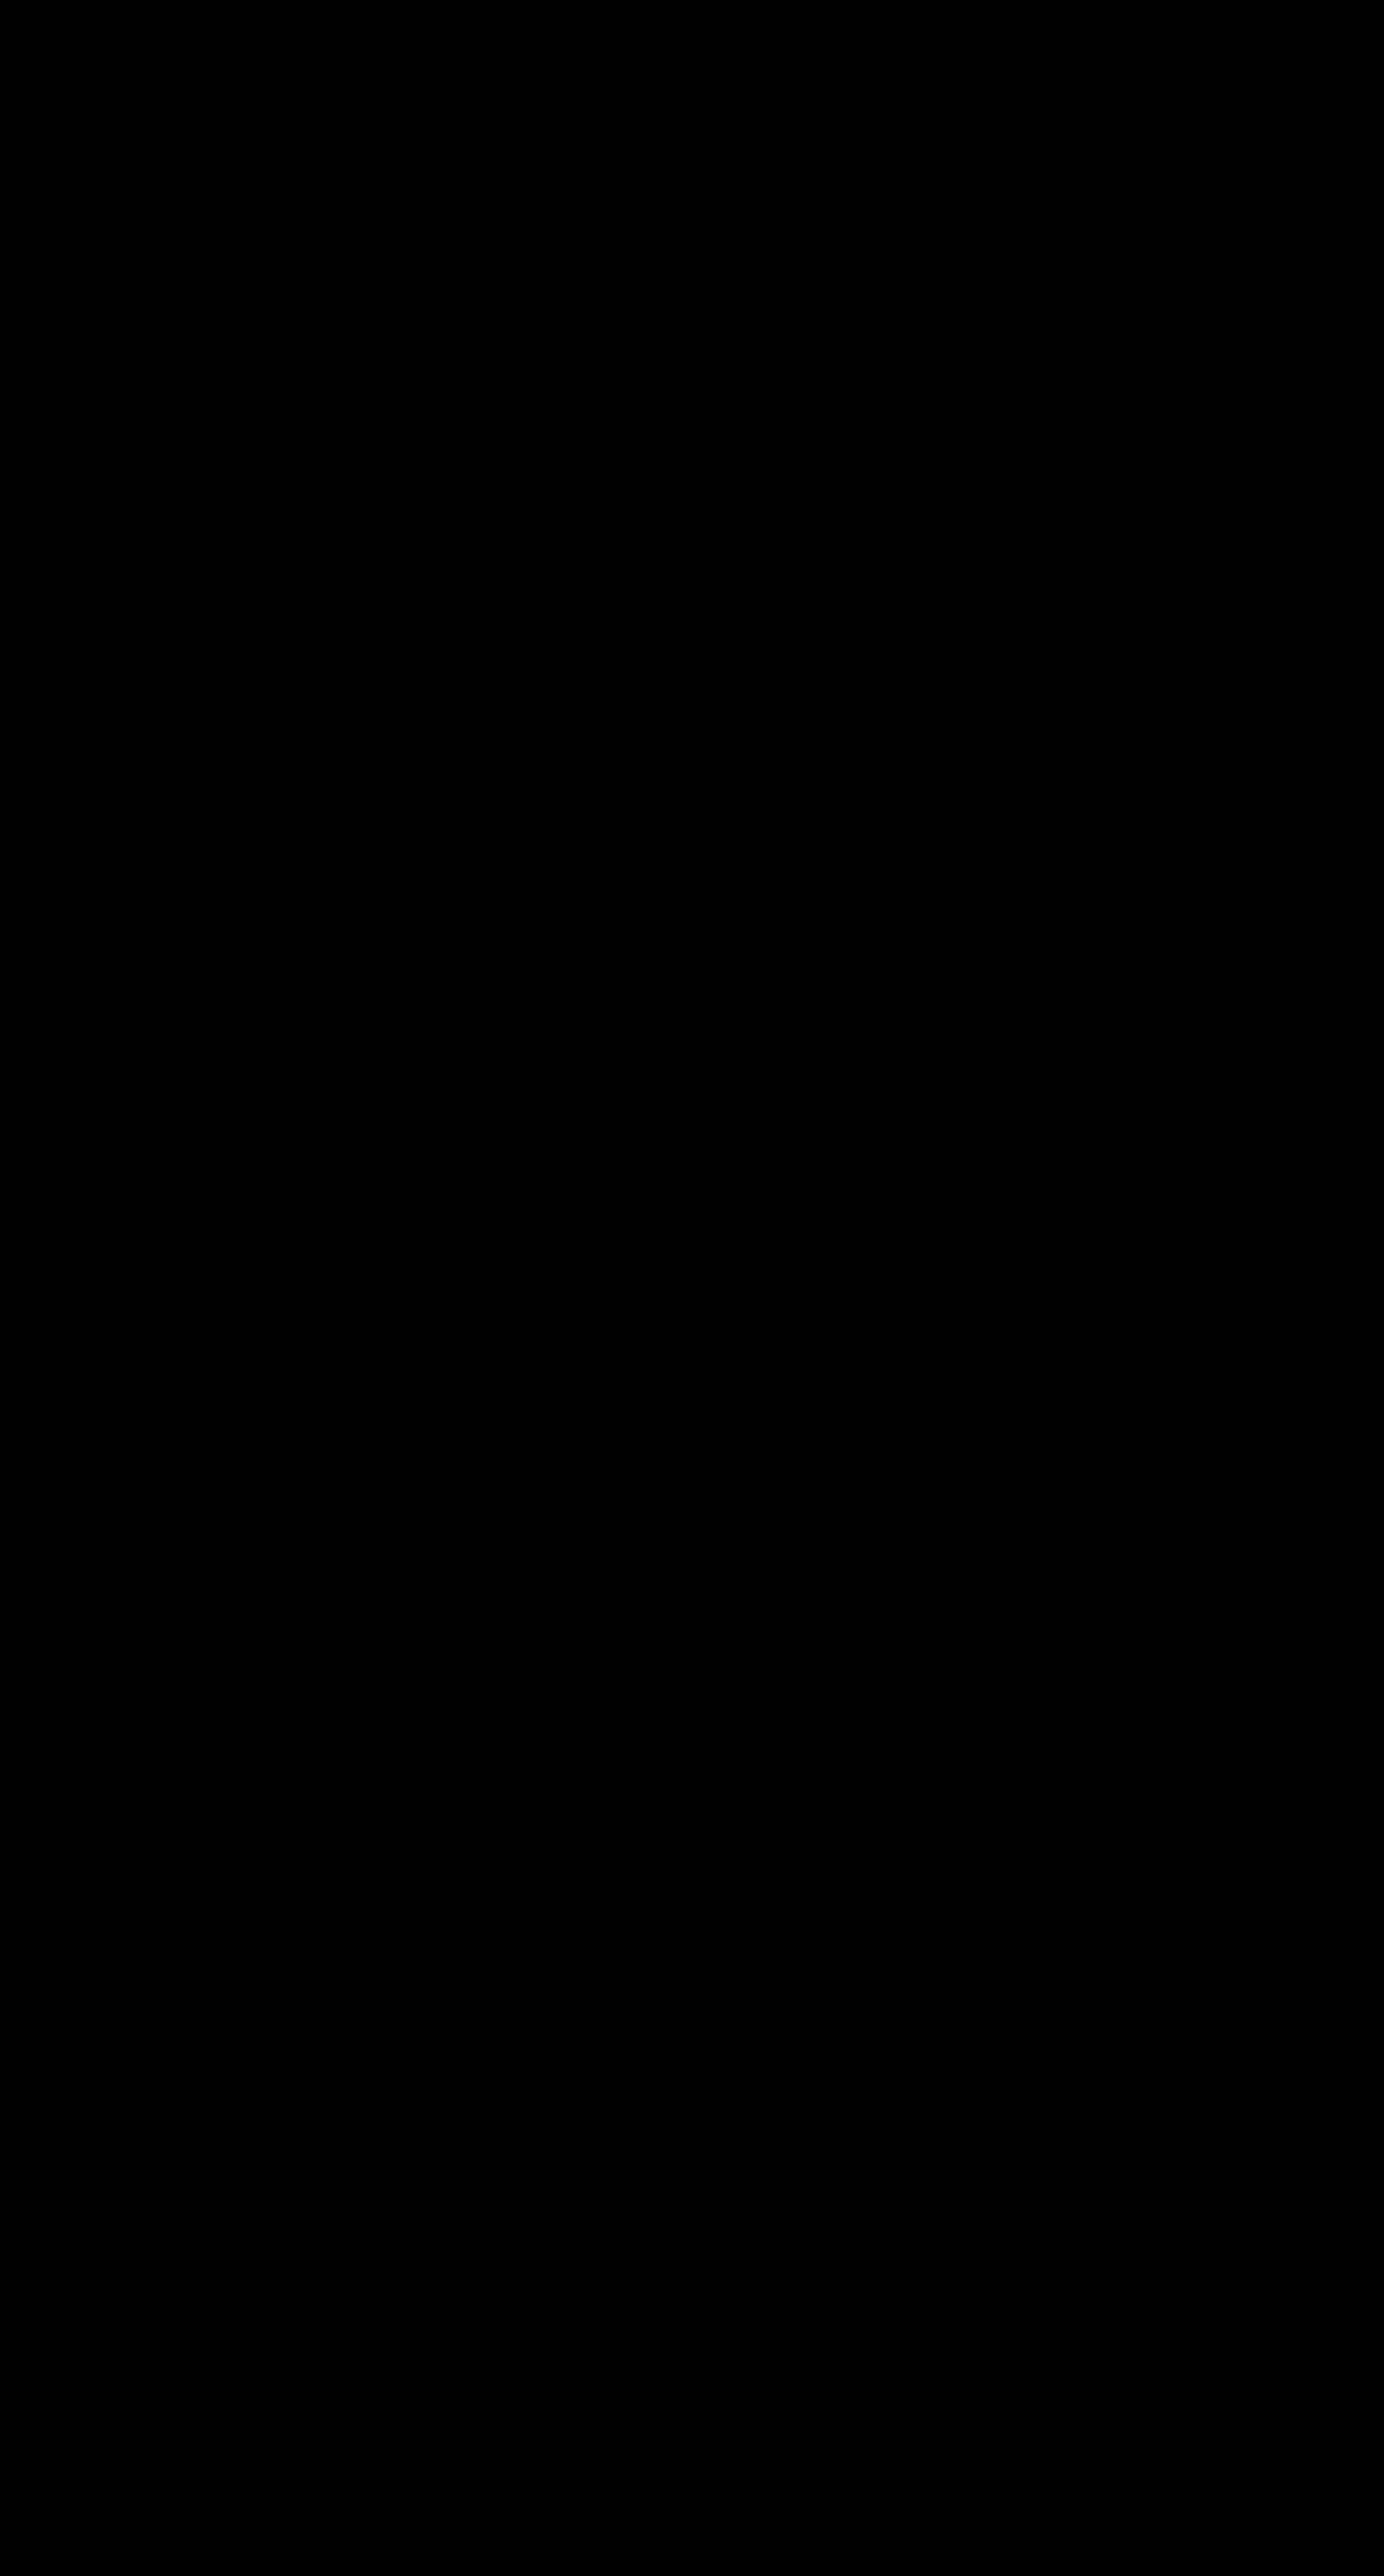 Weiss-antiqua-billboard